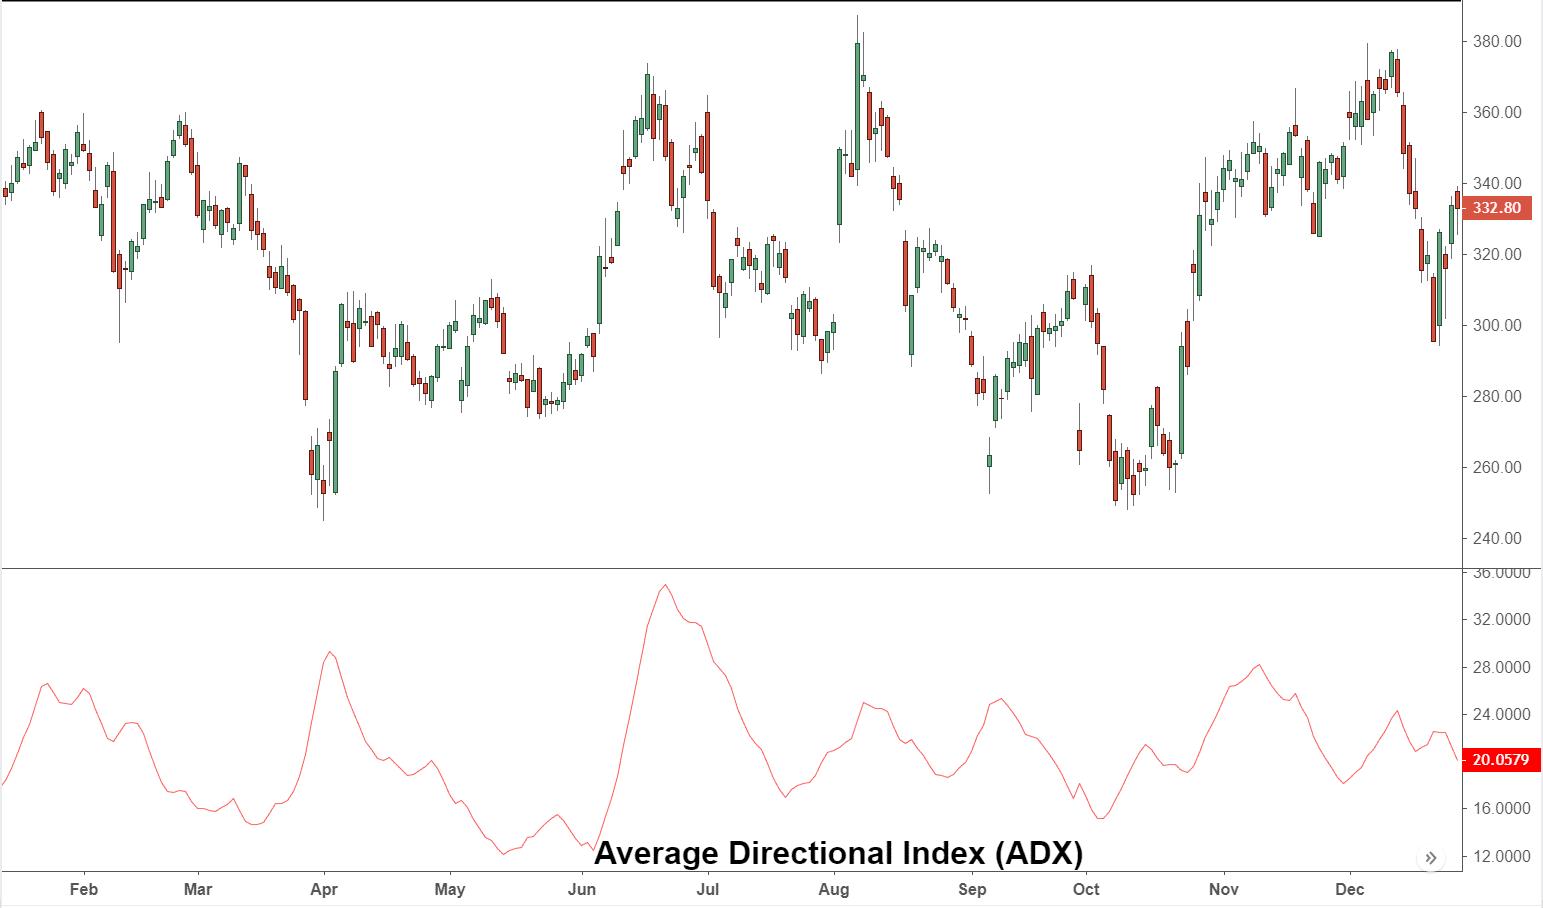 Average Directional Index